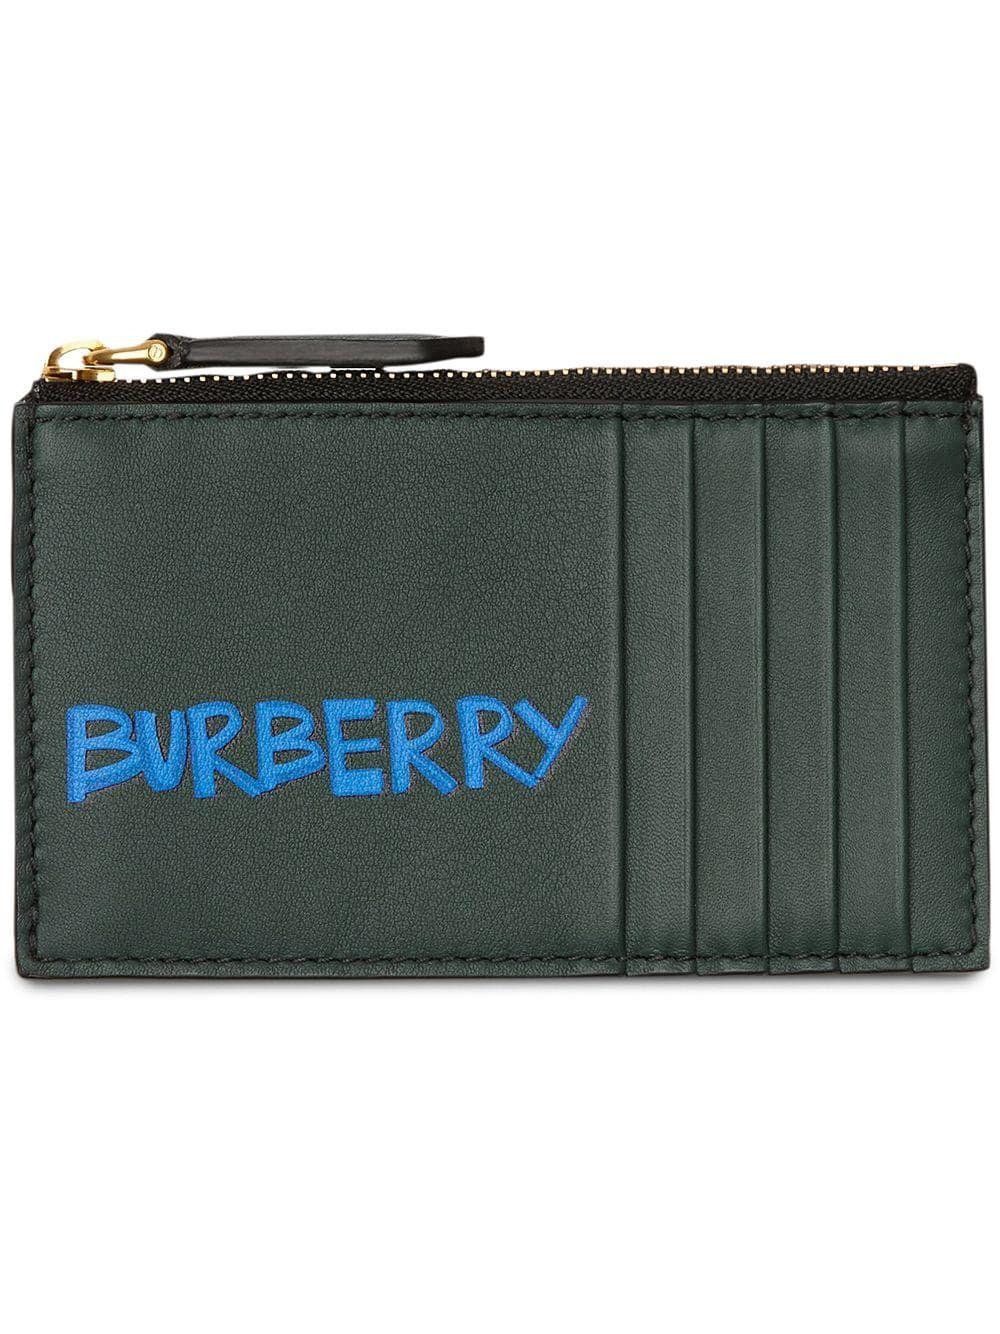 finest selection 87d6e dc6e5 BURBERRY BURBERRY GRAFFITI PRINT LEATHER ZIP CARD CASE - GREEN ...